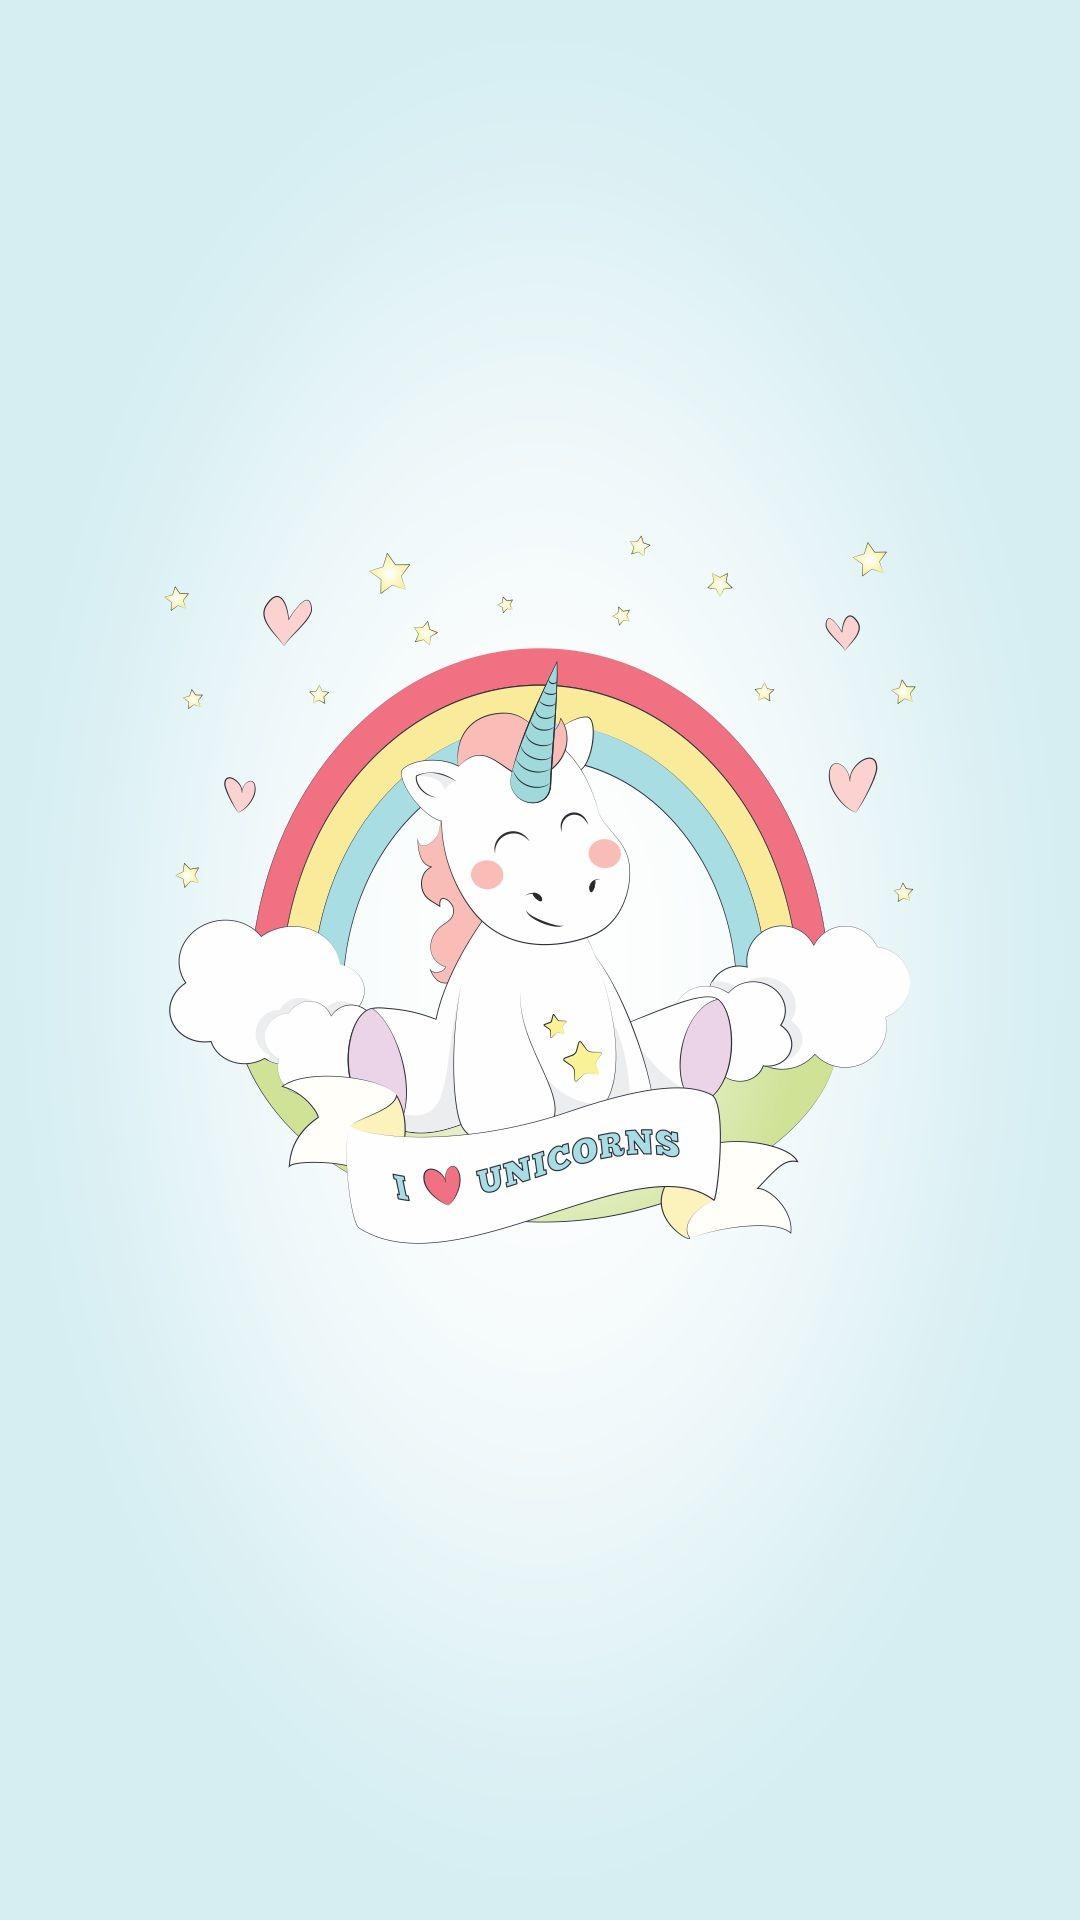 2353x1729 Little Princess And Unicorn Wallpaper